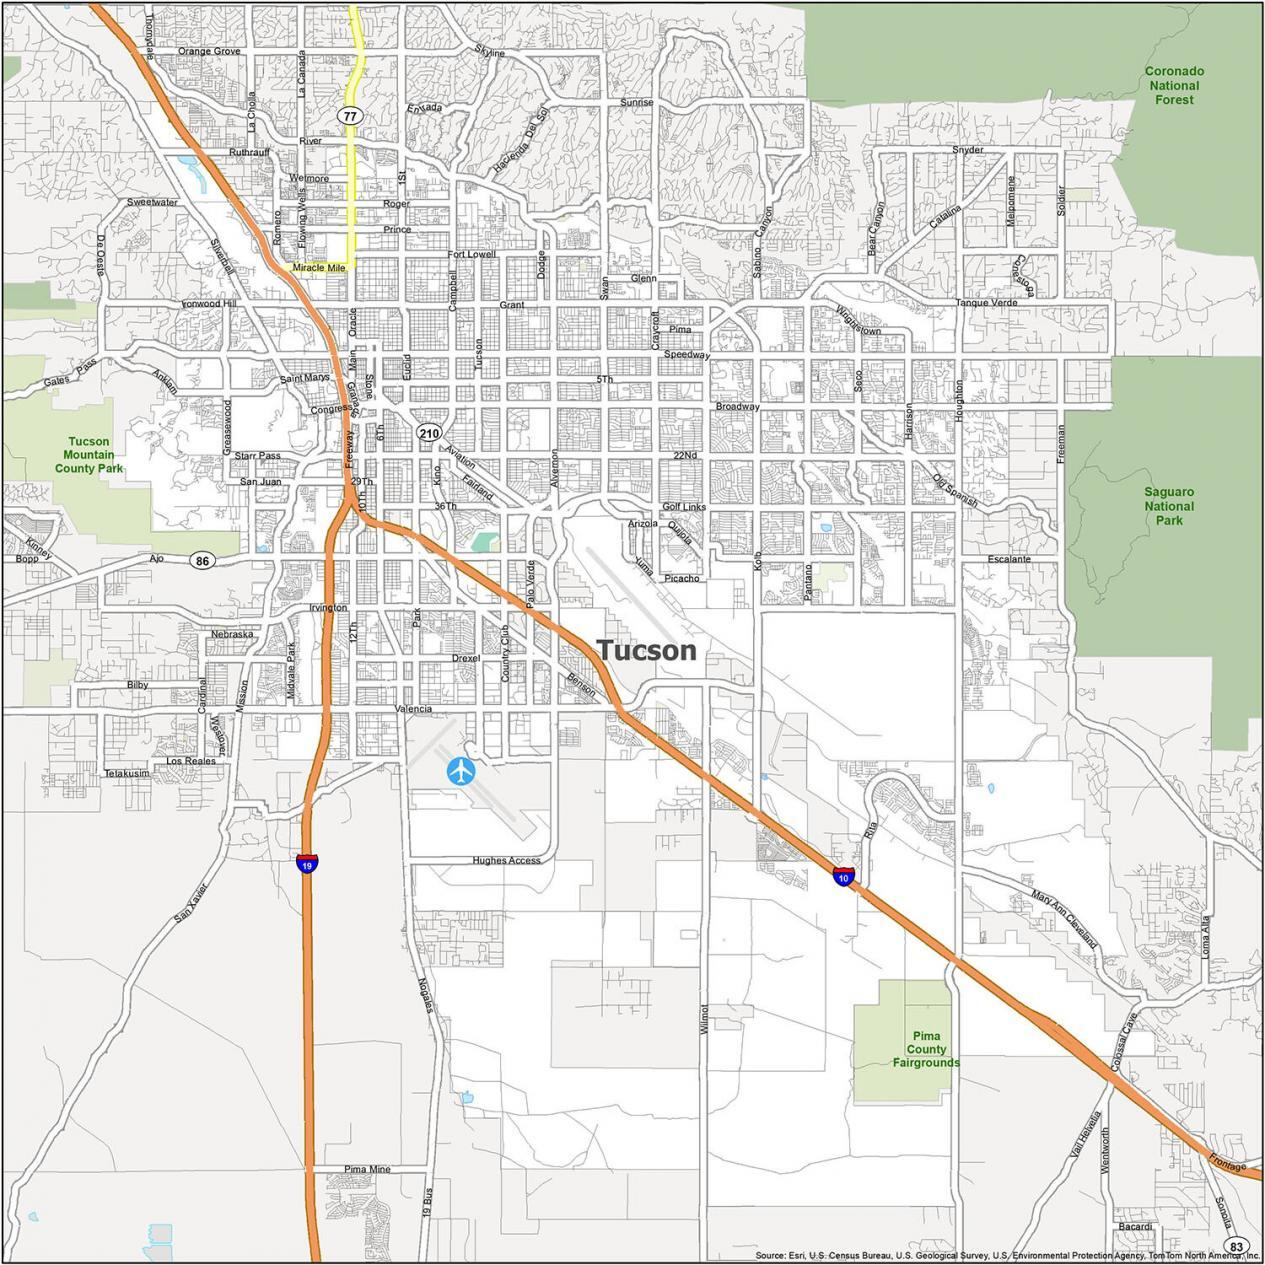 Tucson Road Map